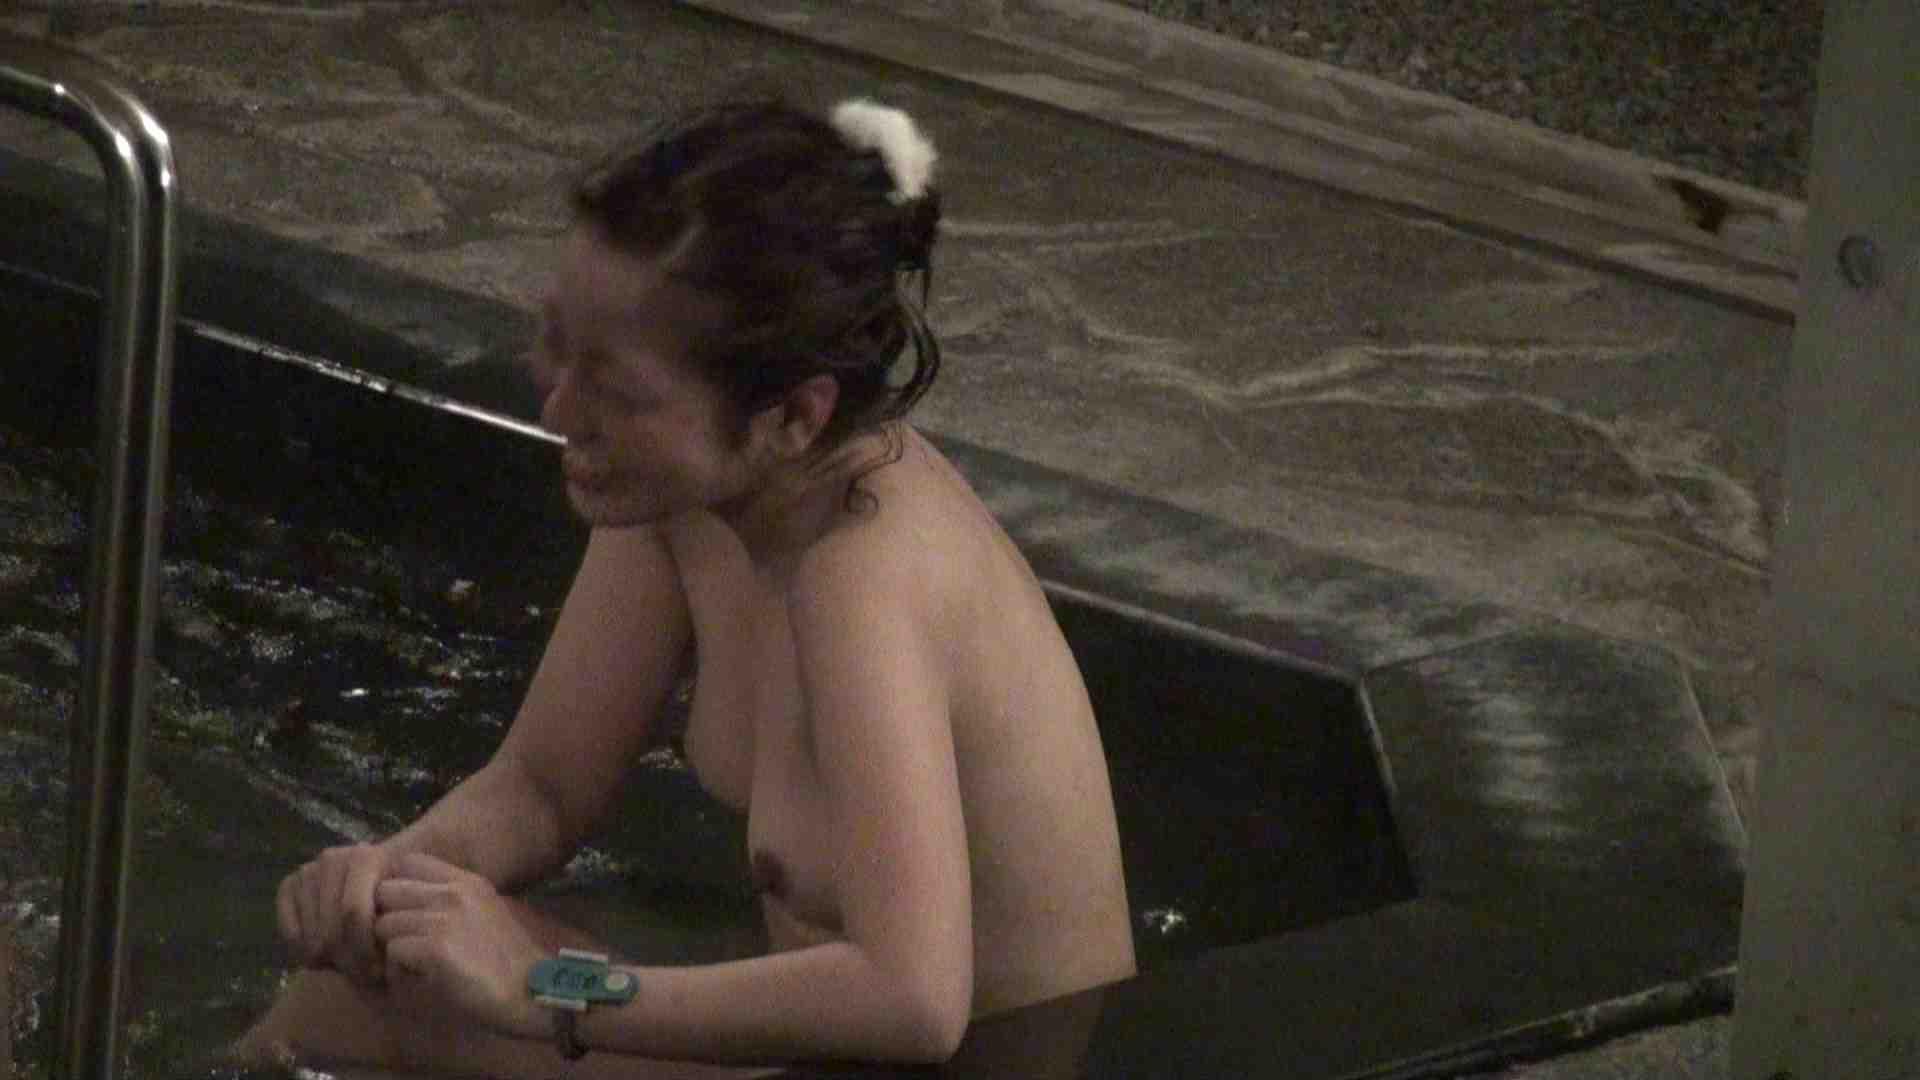 Aquaな露天風呂Vol.422 盗撮映像  61Pix 41